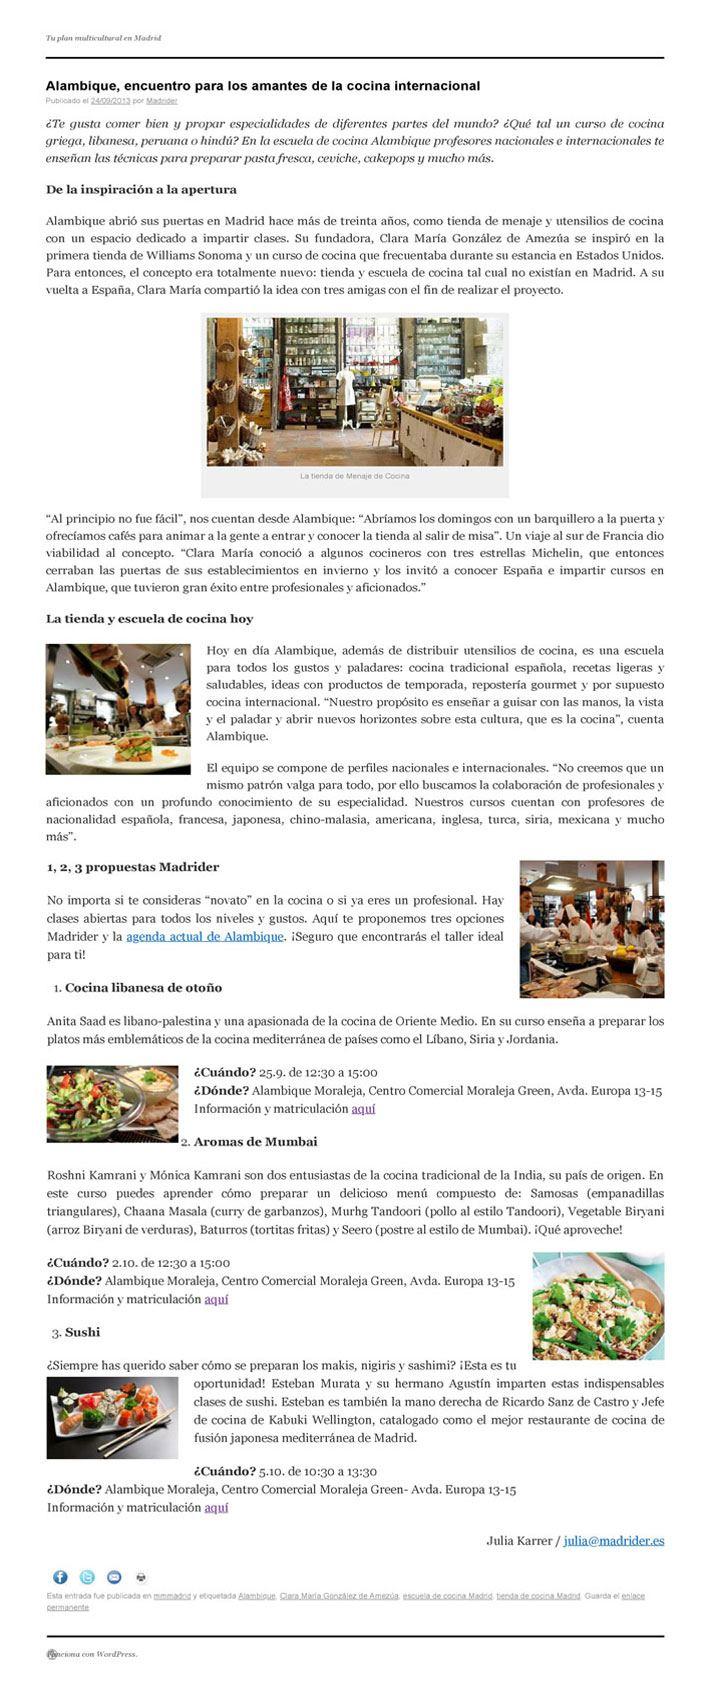 ARTICULO DE MADRIDER SOBRE ALAMBIQUE